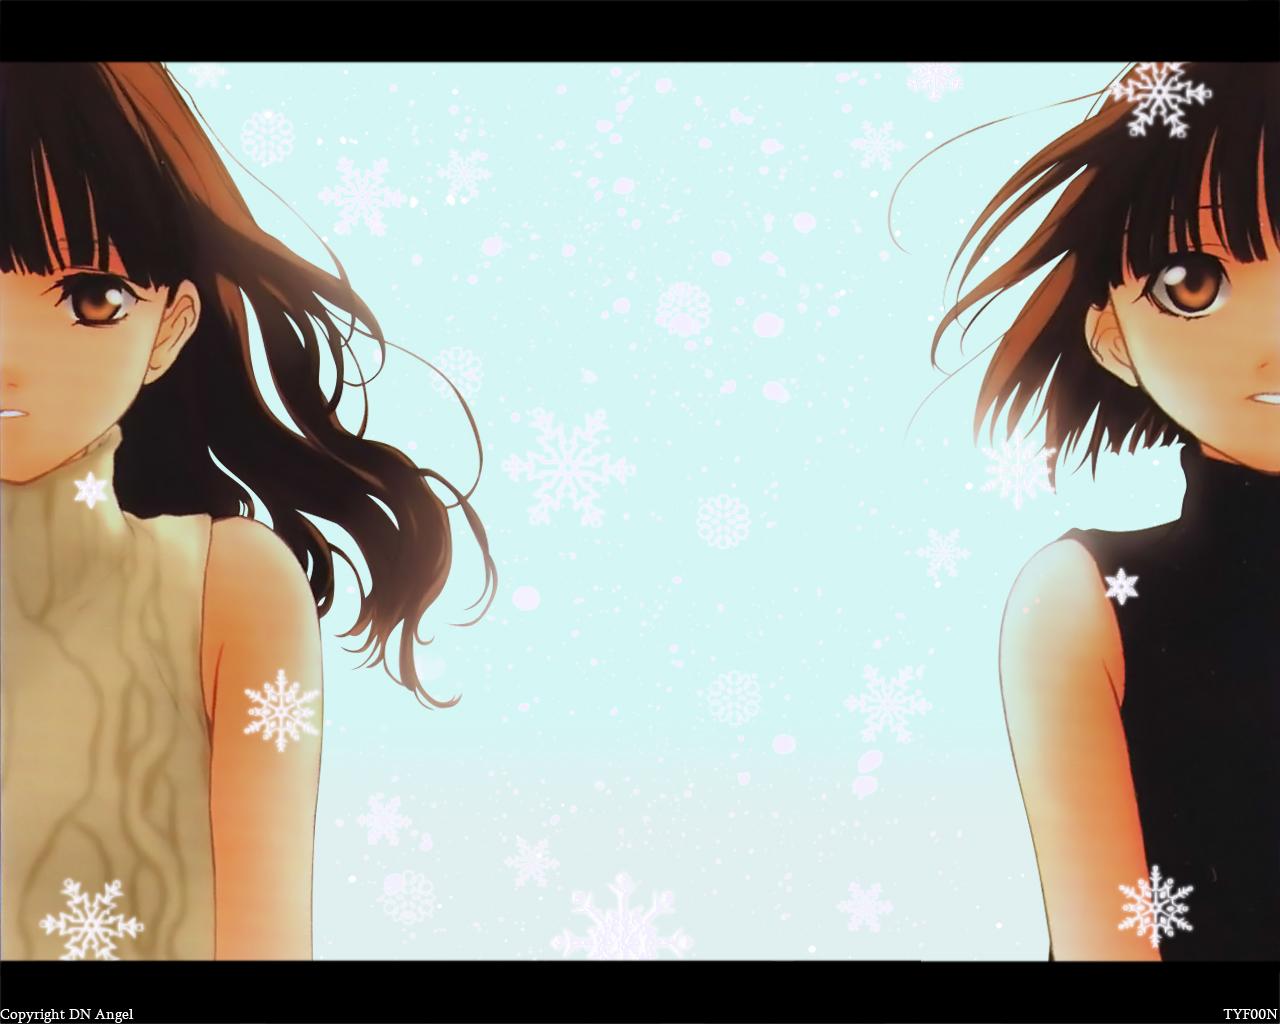 dnangel harada_riku harada_risa sugisaki_yukiru twins